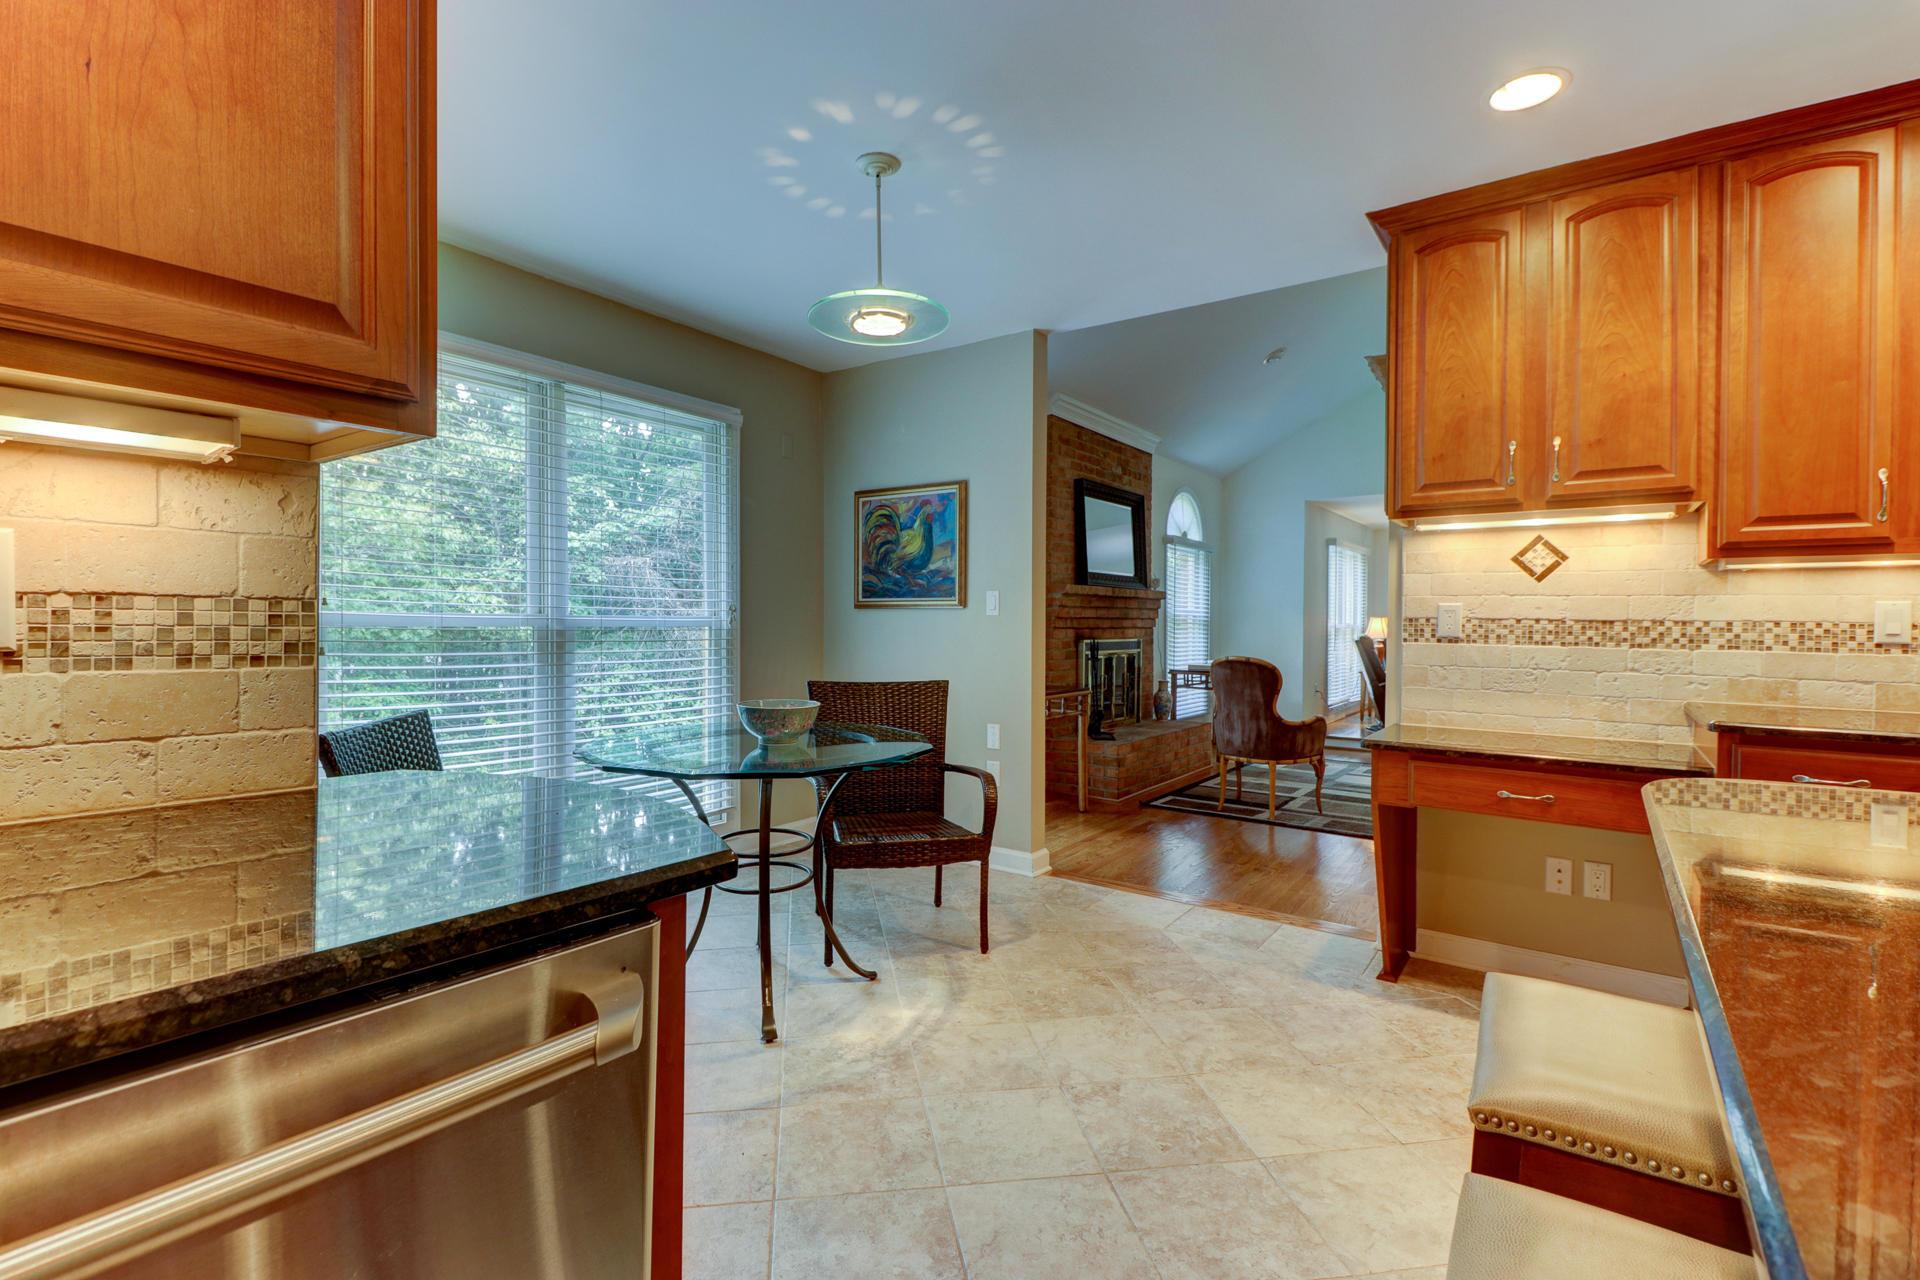 5295 Flintlock RD, Roanoke, VA 24018 (MLS# 851964) - Hunter Moore ...